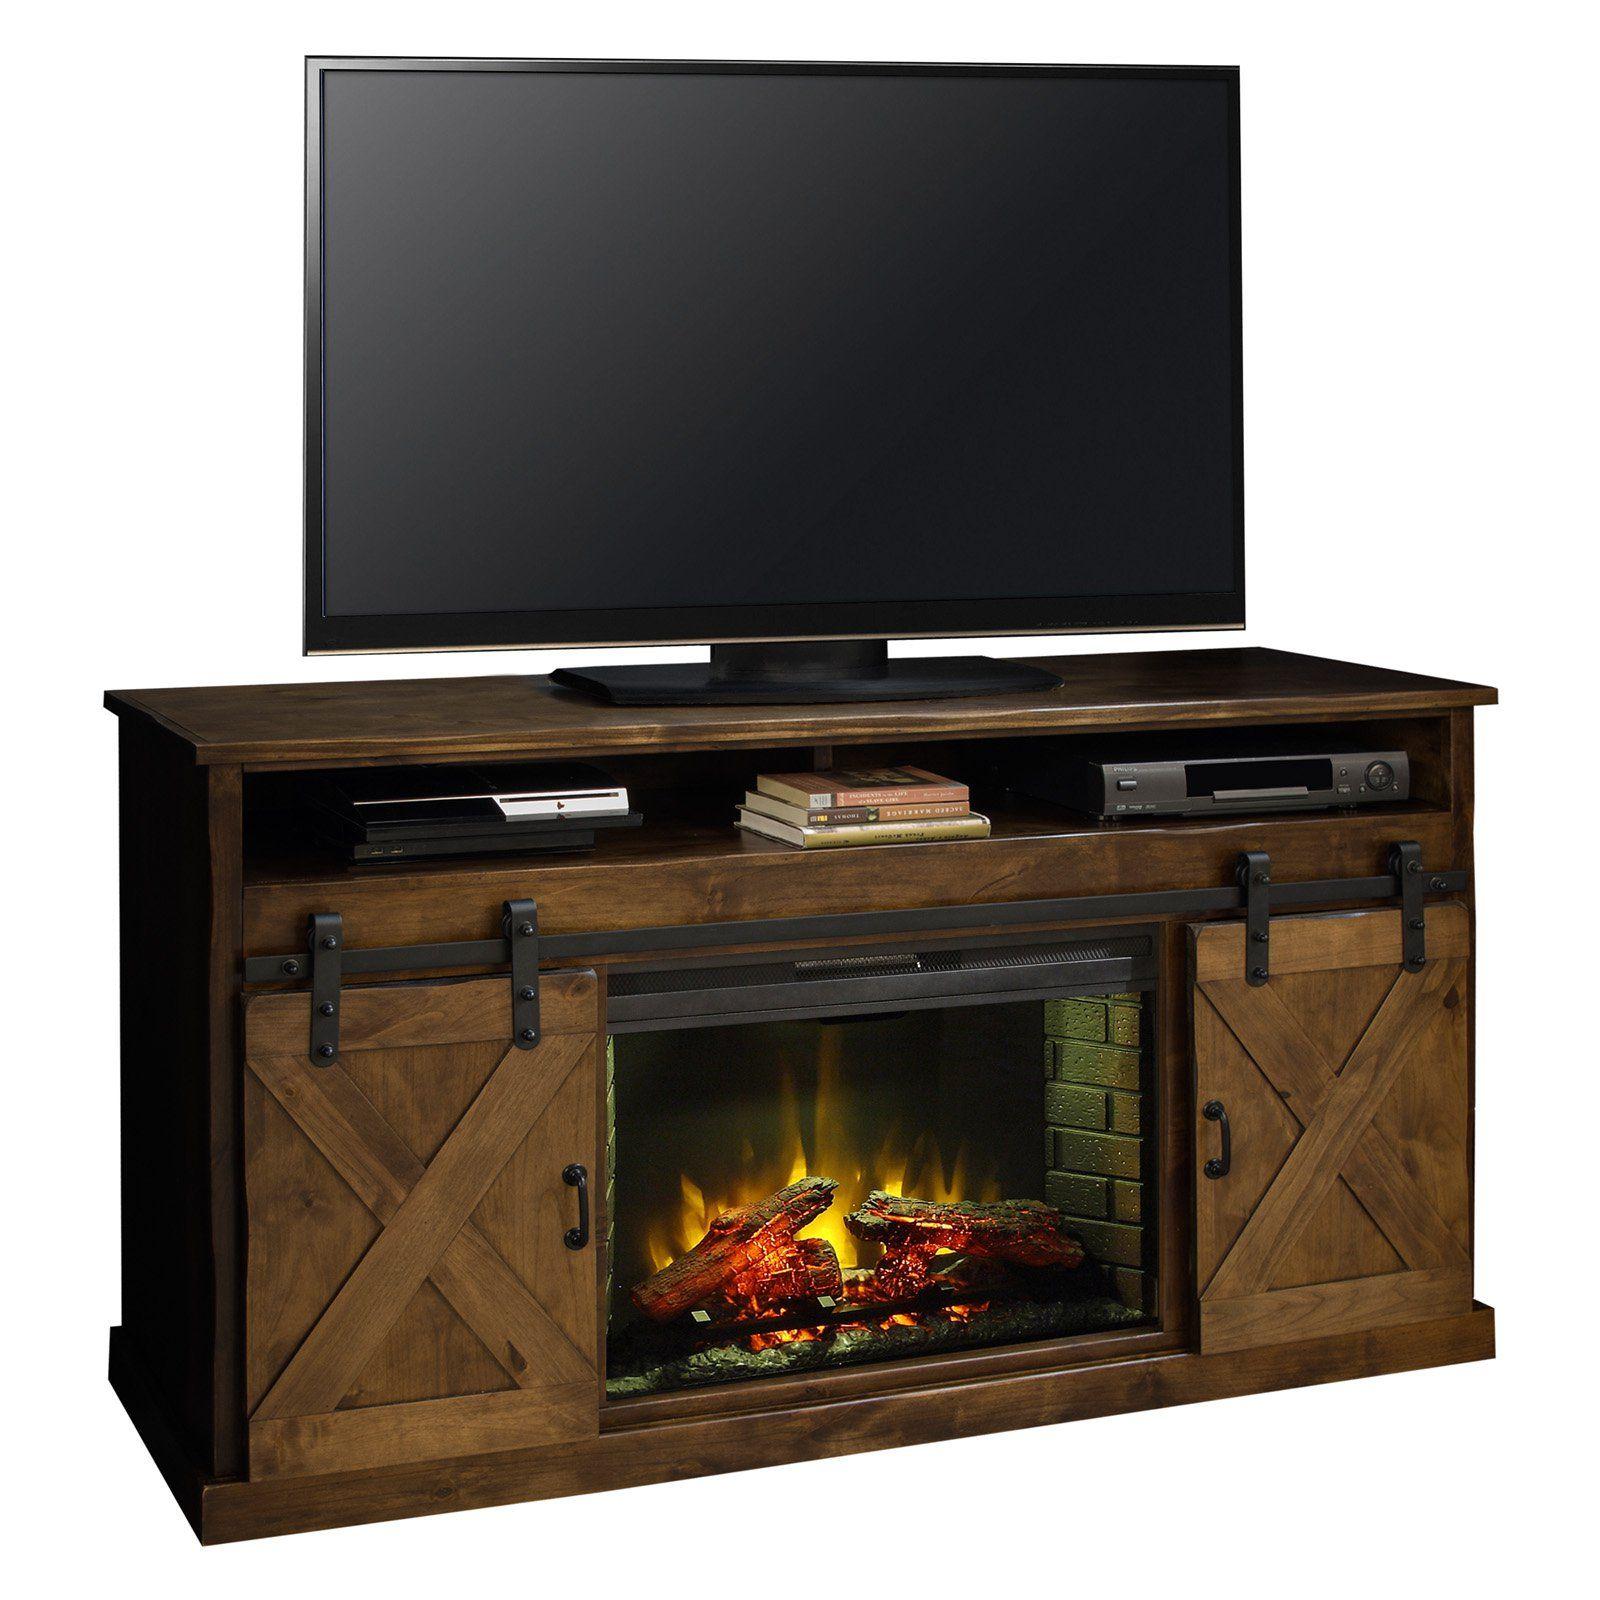 Legends Furniture Farmhouse 66 in. Fireplace Console